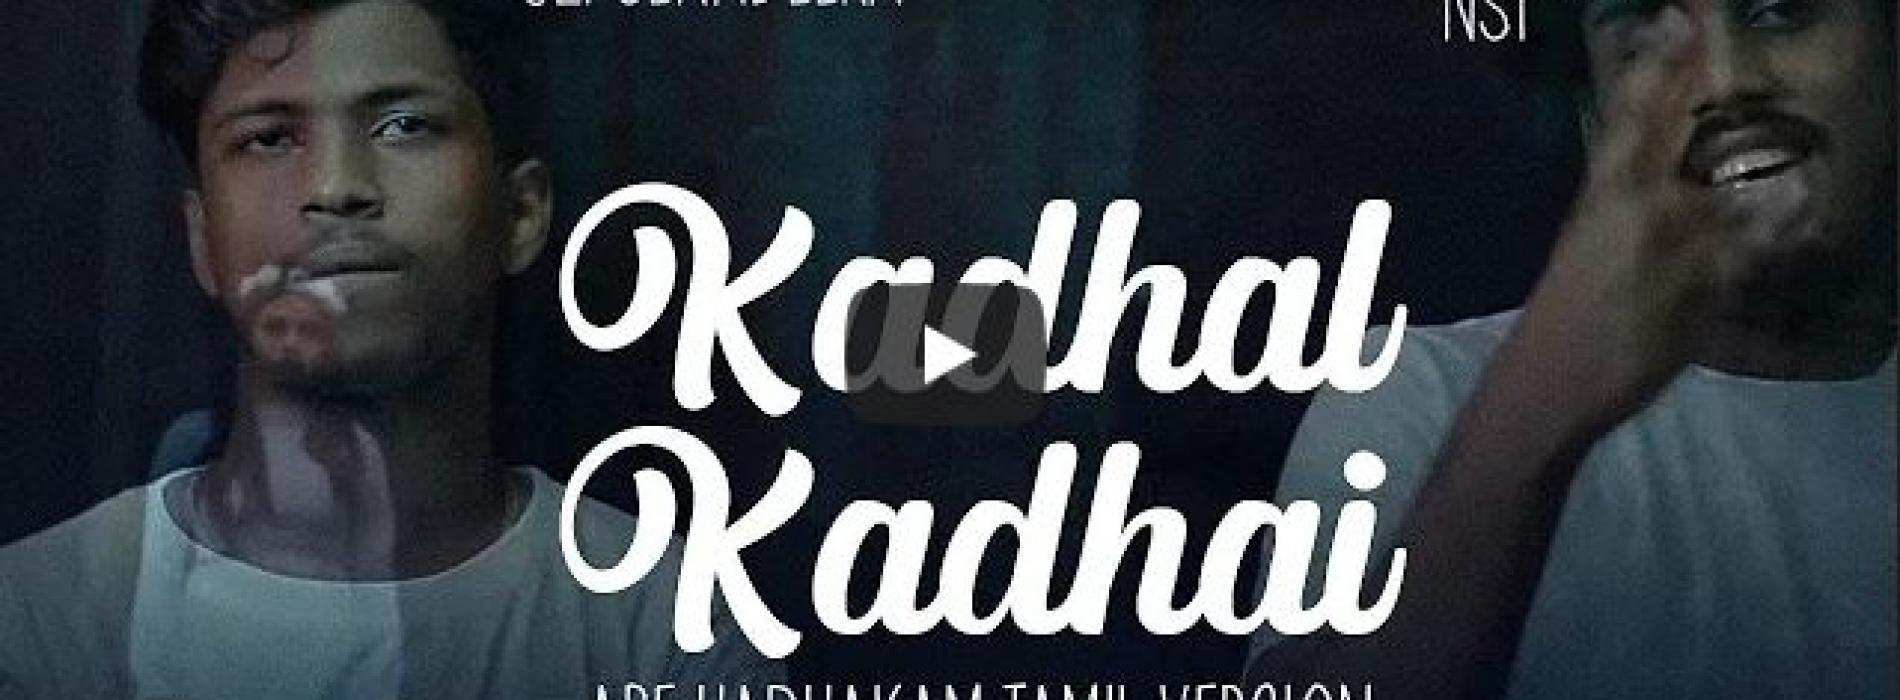 News : Sinhala and Tamil New Year Surprise – Kadhal Kadhai